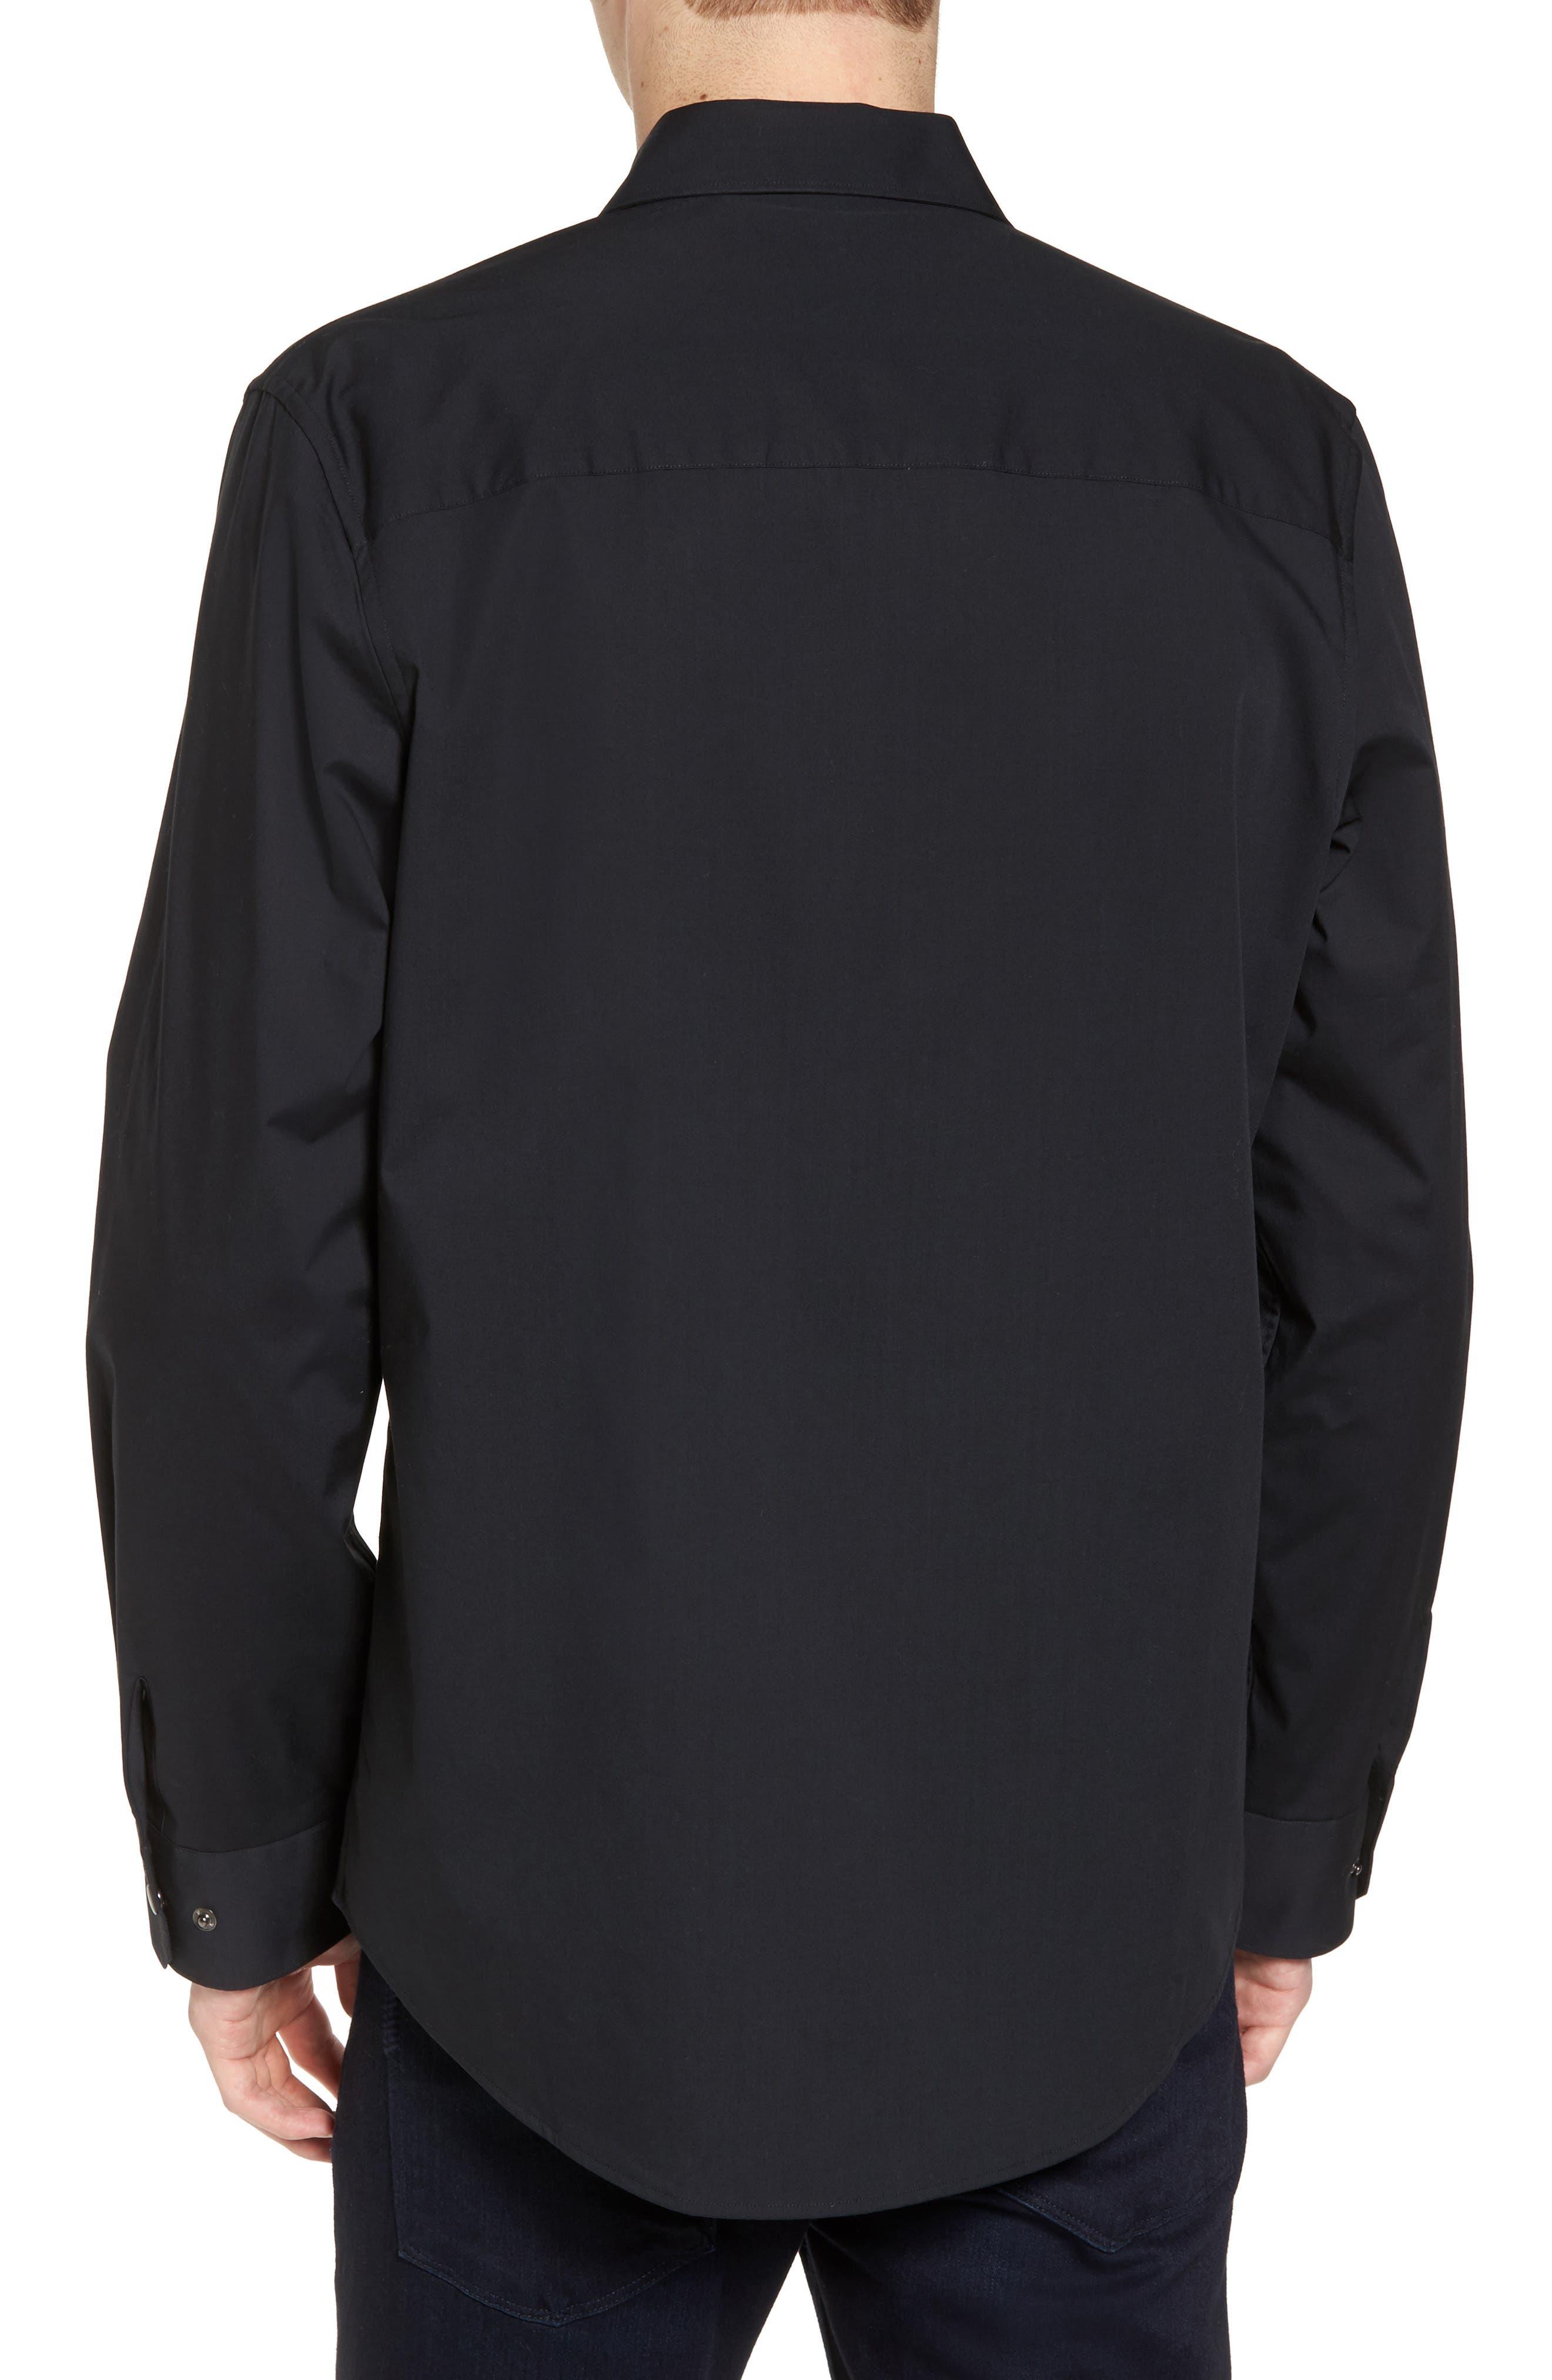 Zip Shirt Jacket,                             Alternate thumbnail 2, color,                             001